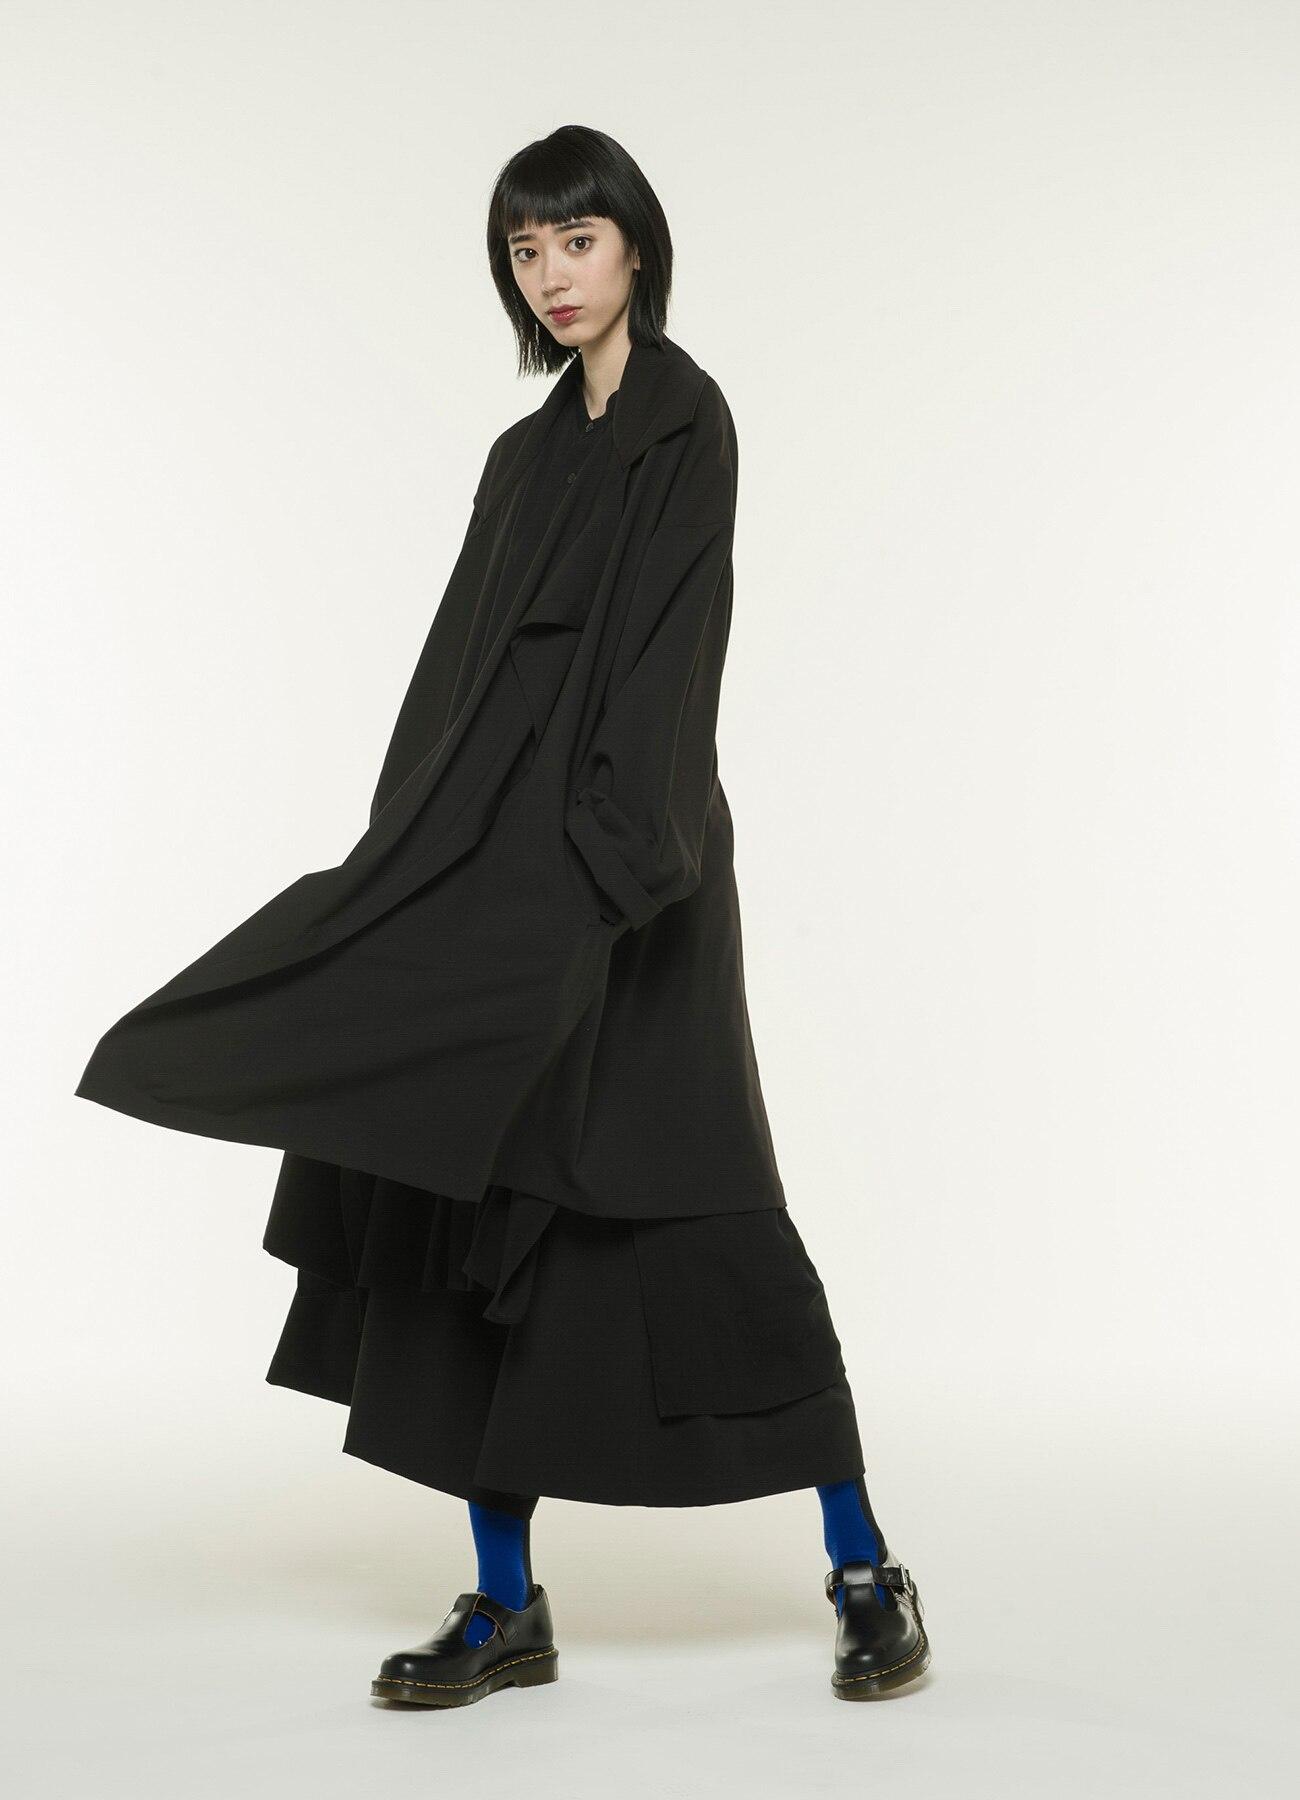 Pe/Rayon Gabardine Stretch Frame Double Collar Drape Coat